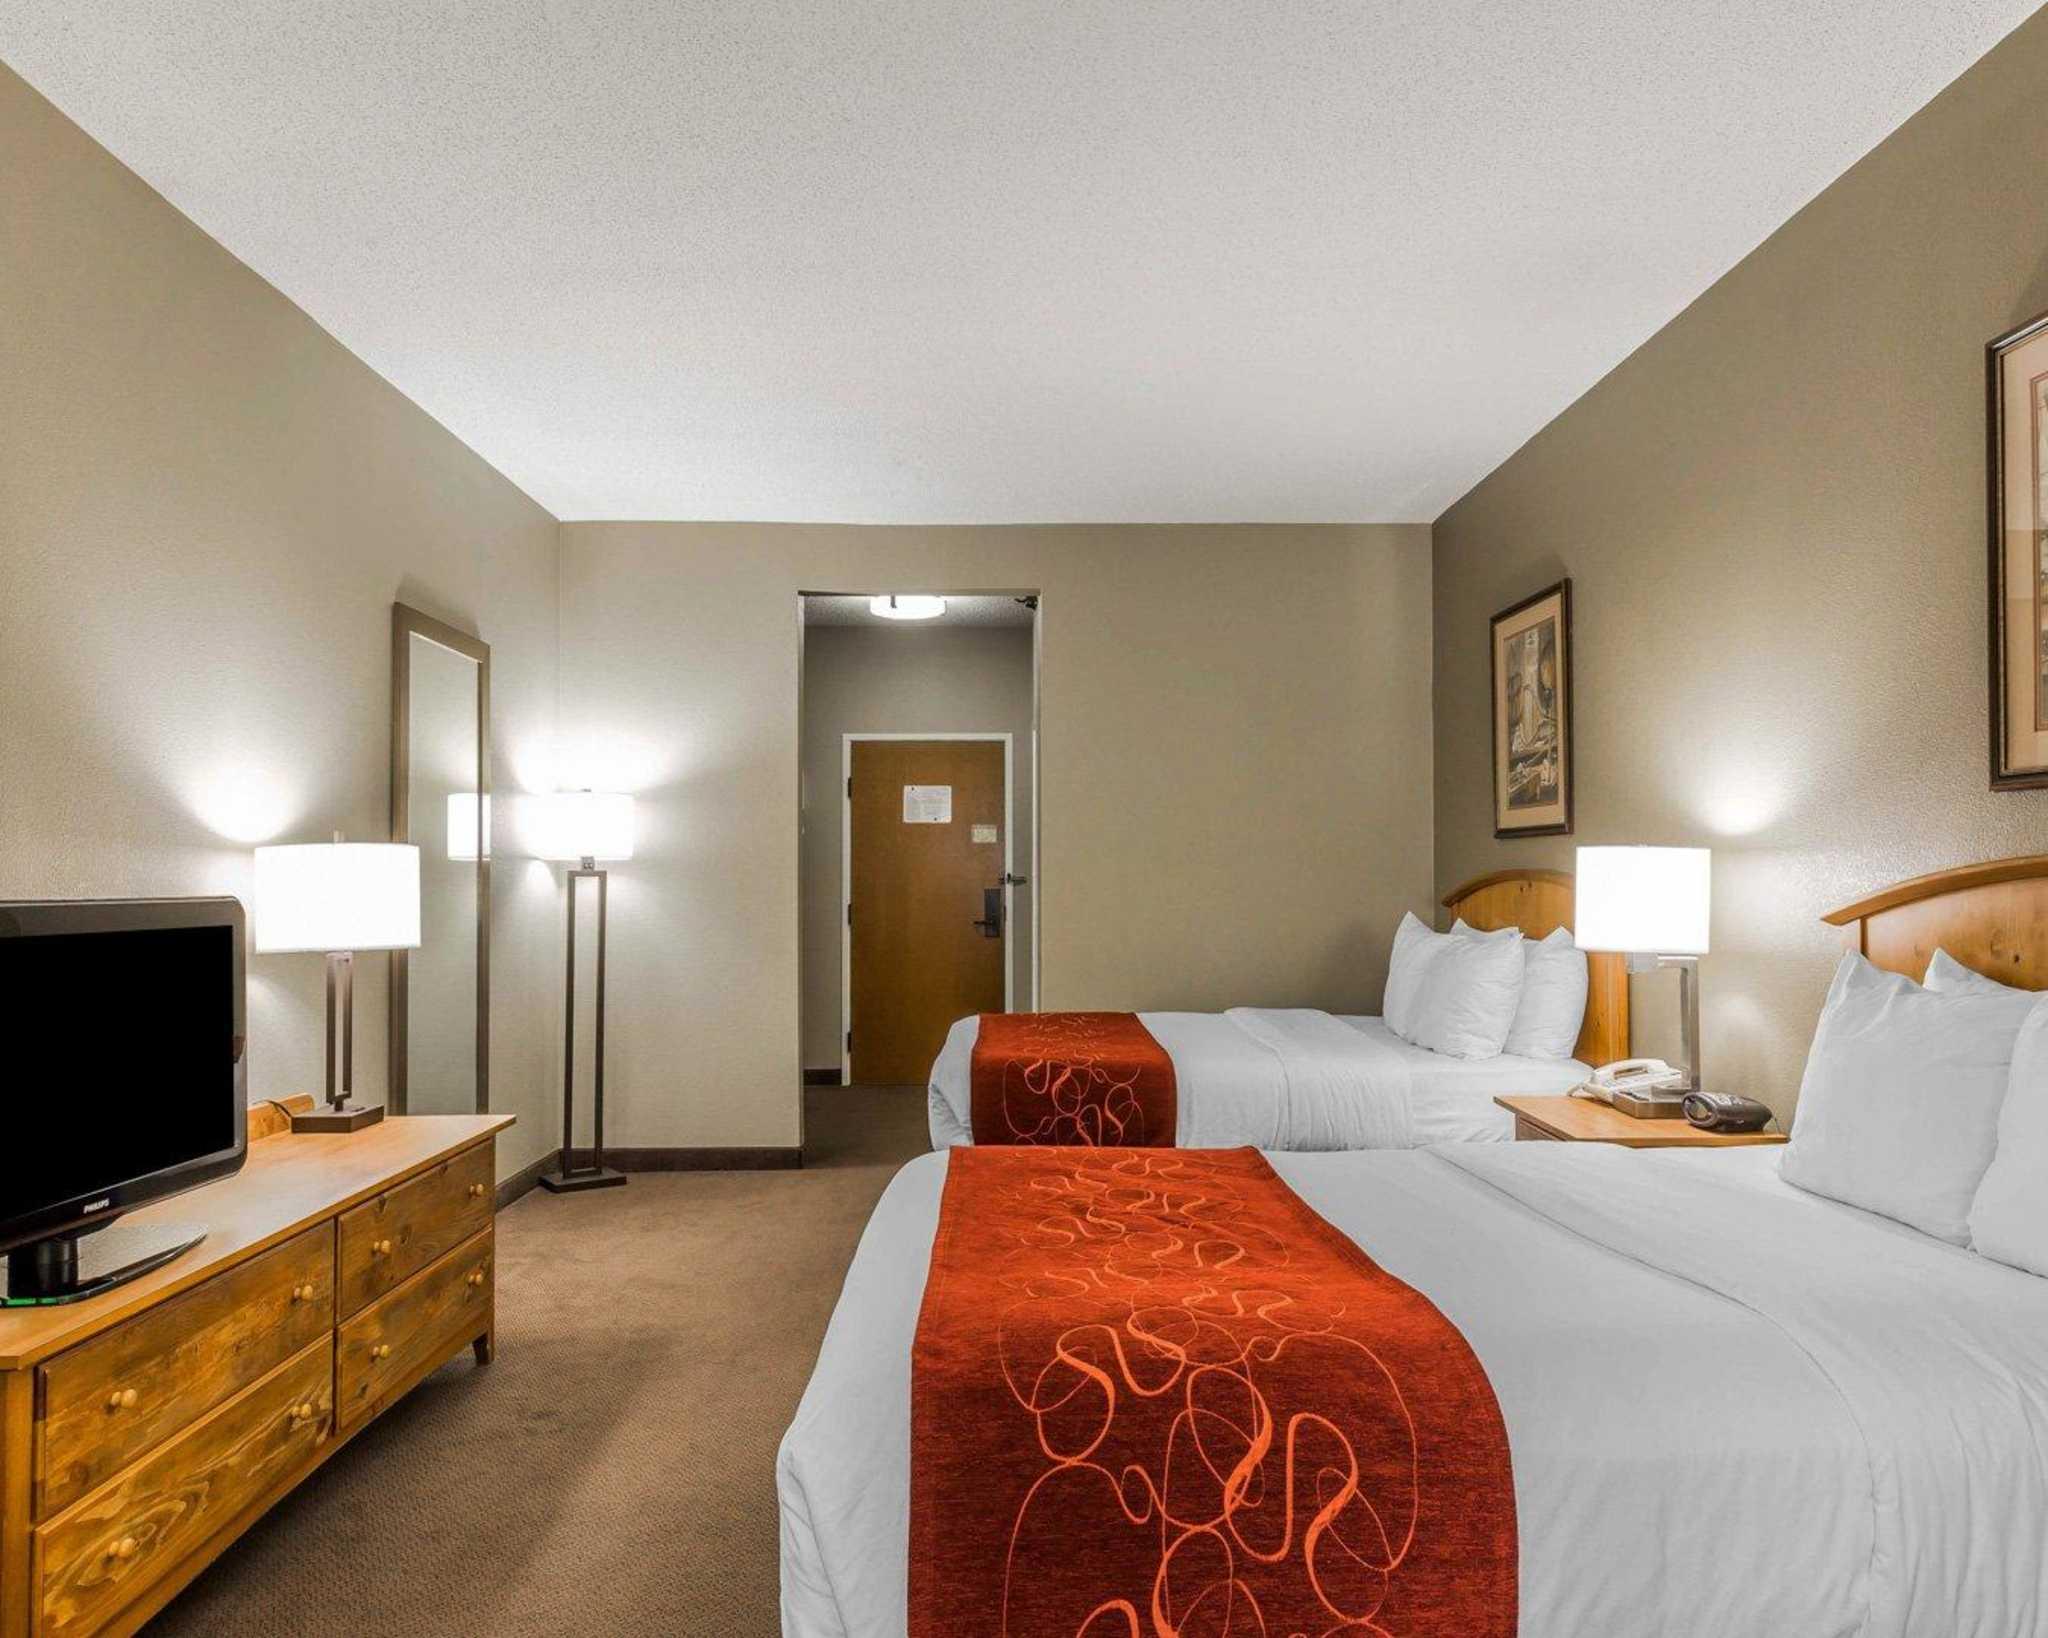 Comfort Suites image 6